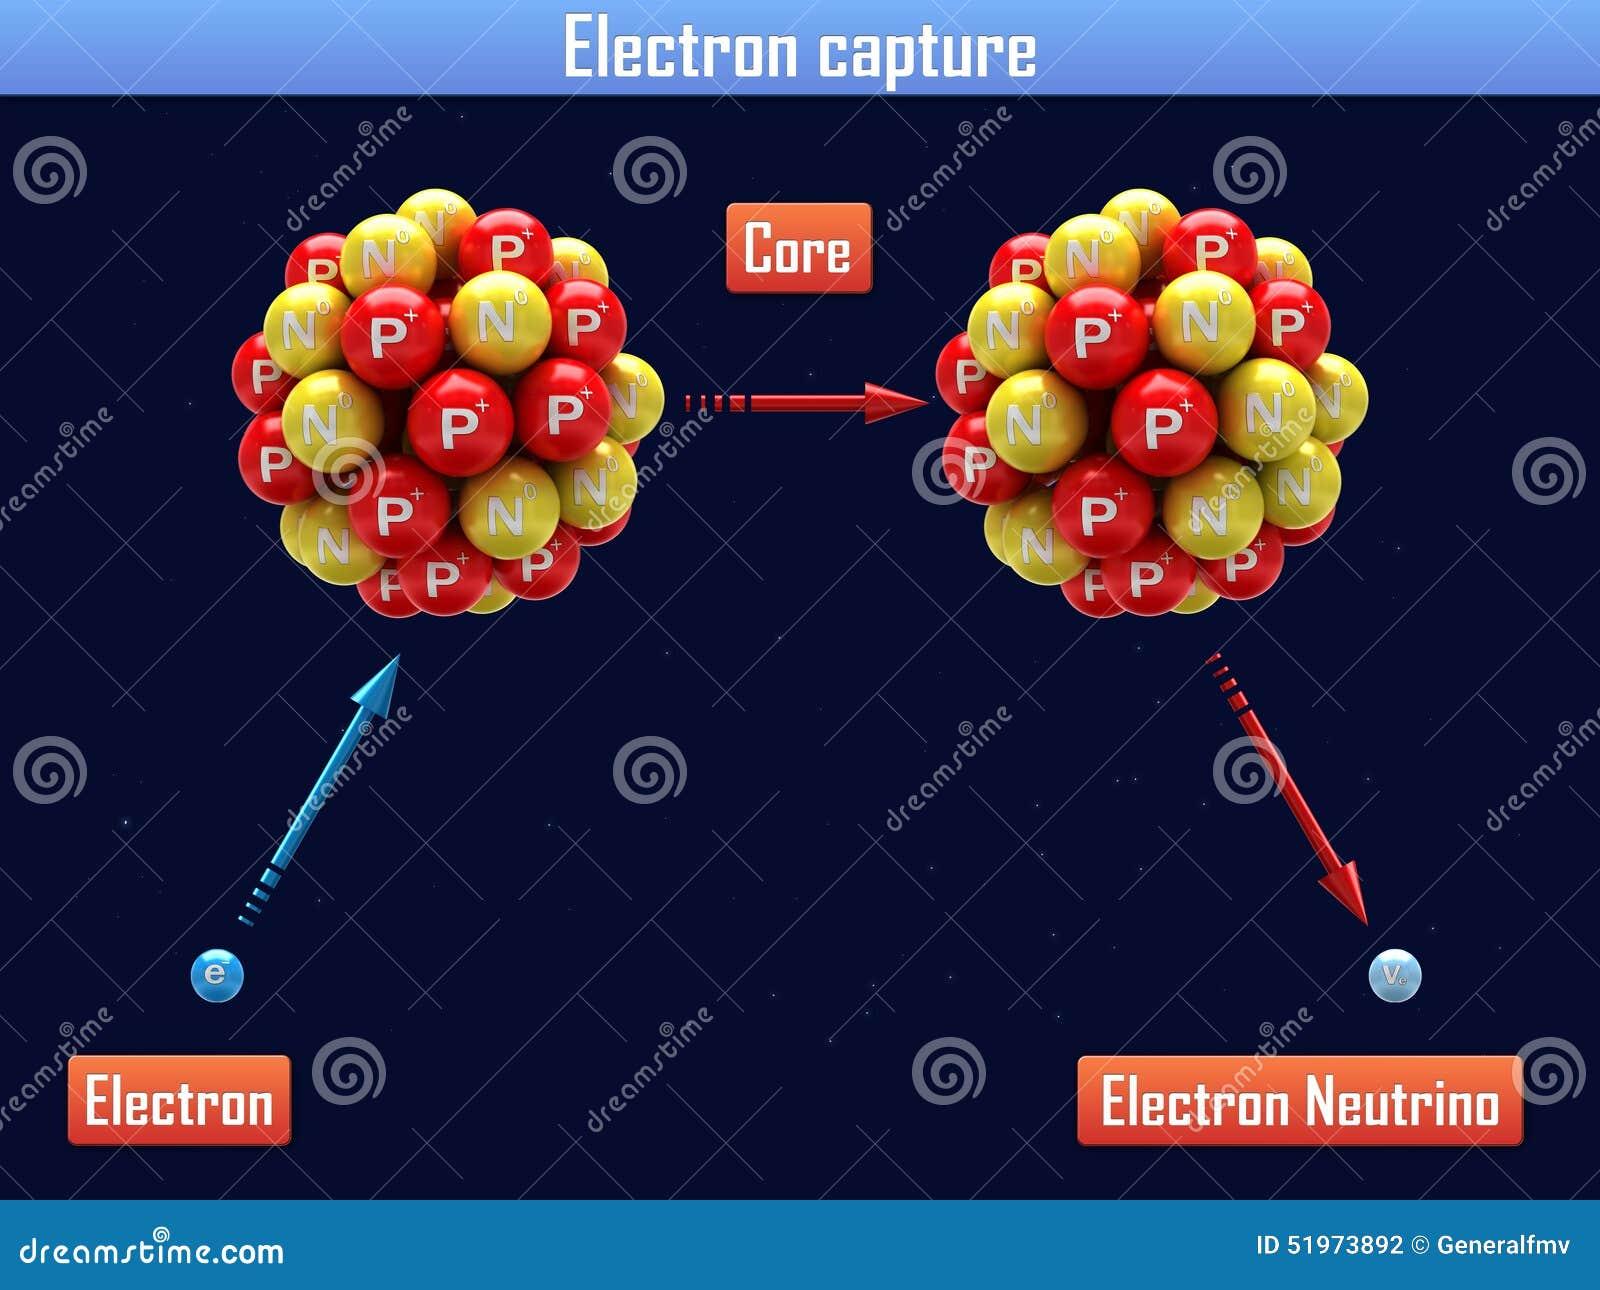 Download Electron Capture Stock Illustration Of Wallpaper